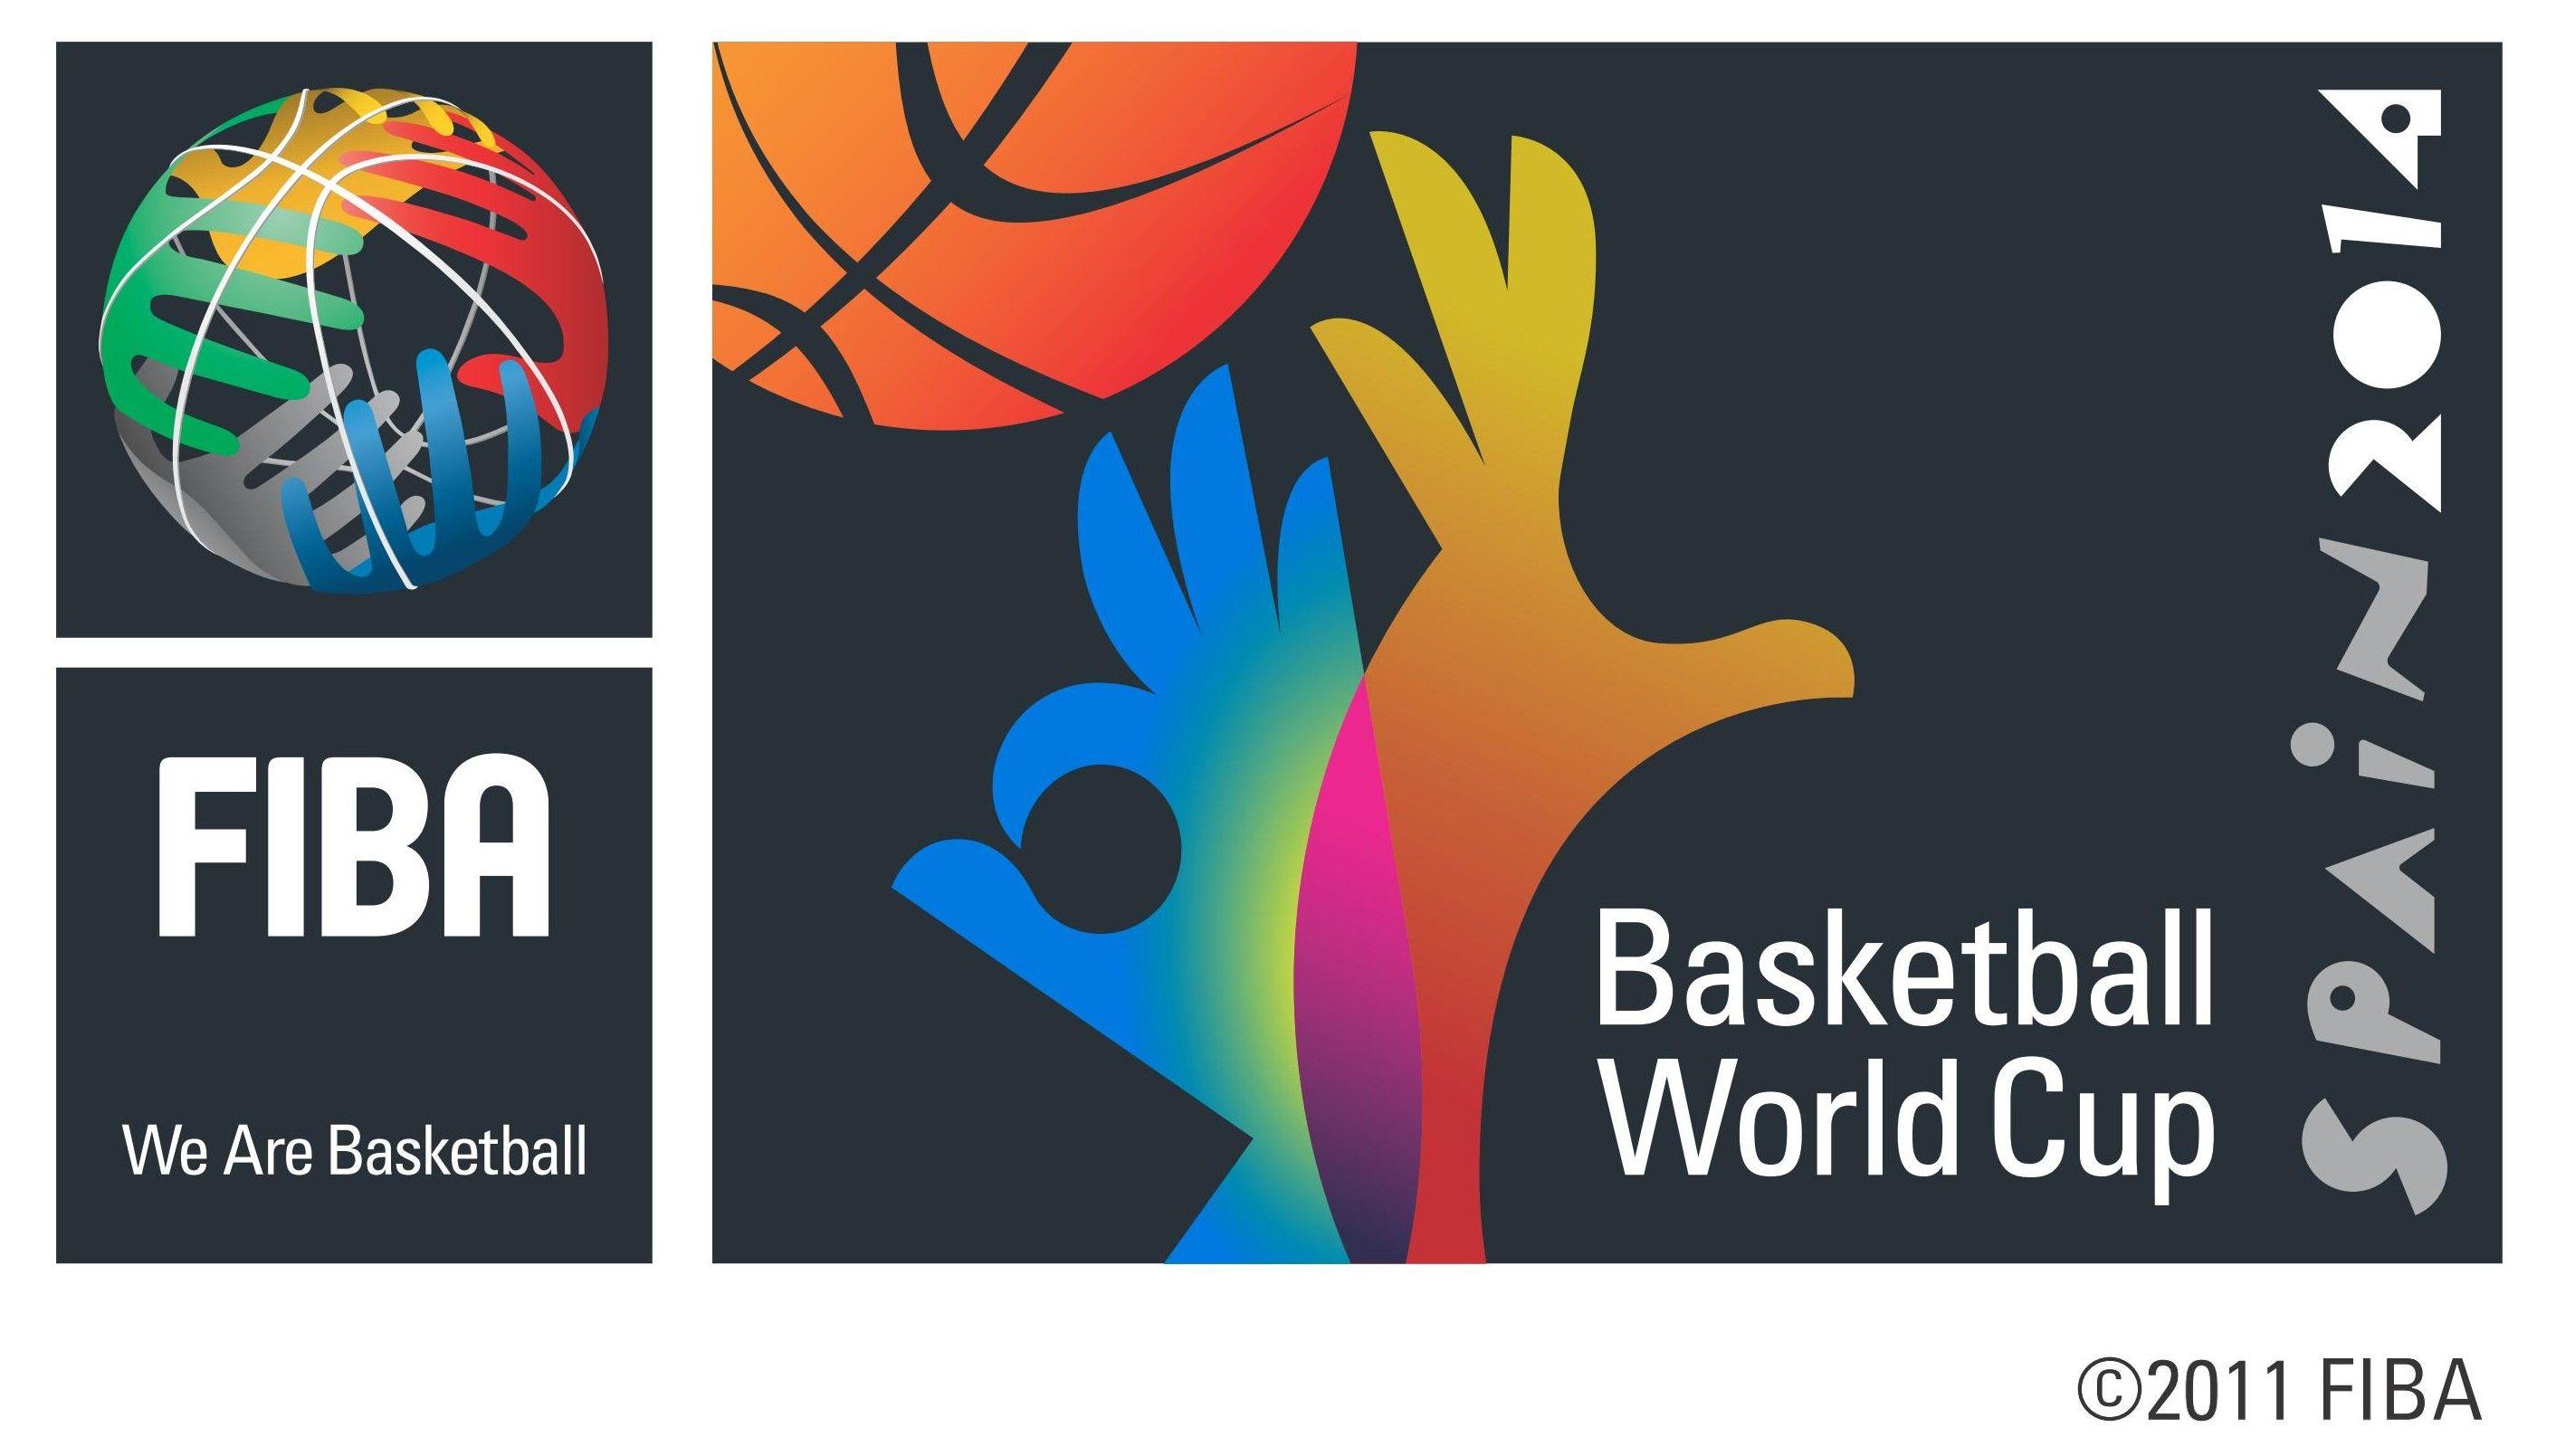 2014 Fiba Basketball World Cup Logo Fiba Basketball World Cup Logo World Cup